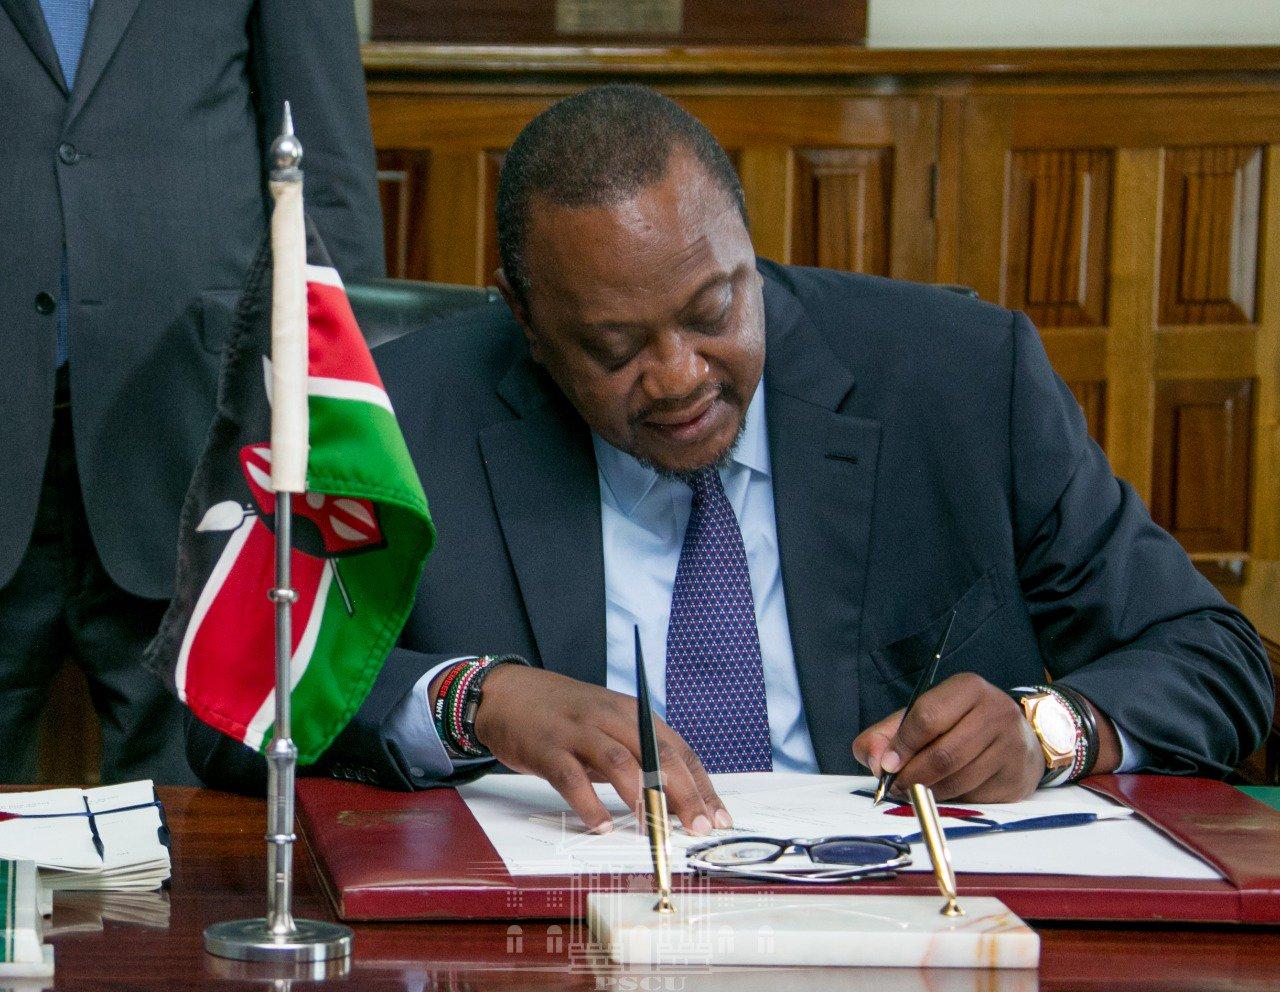 President Kenyatta Reshuffles Cabinet, Reassigns Principle Secretaries